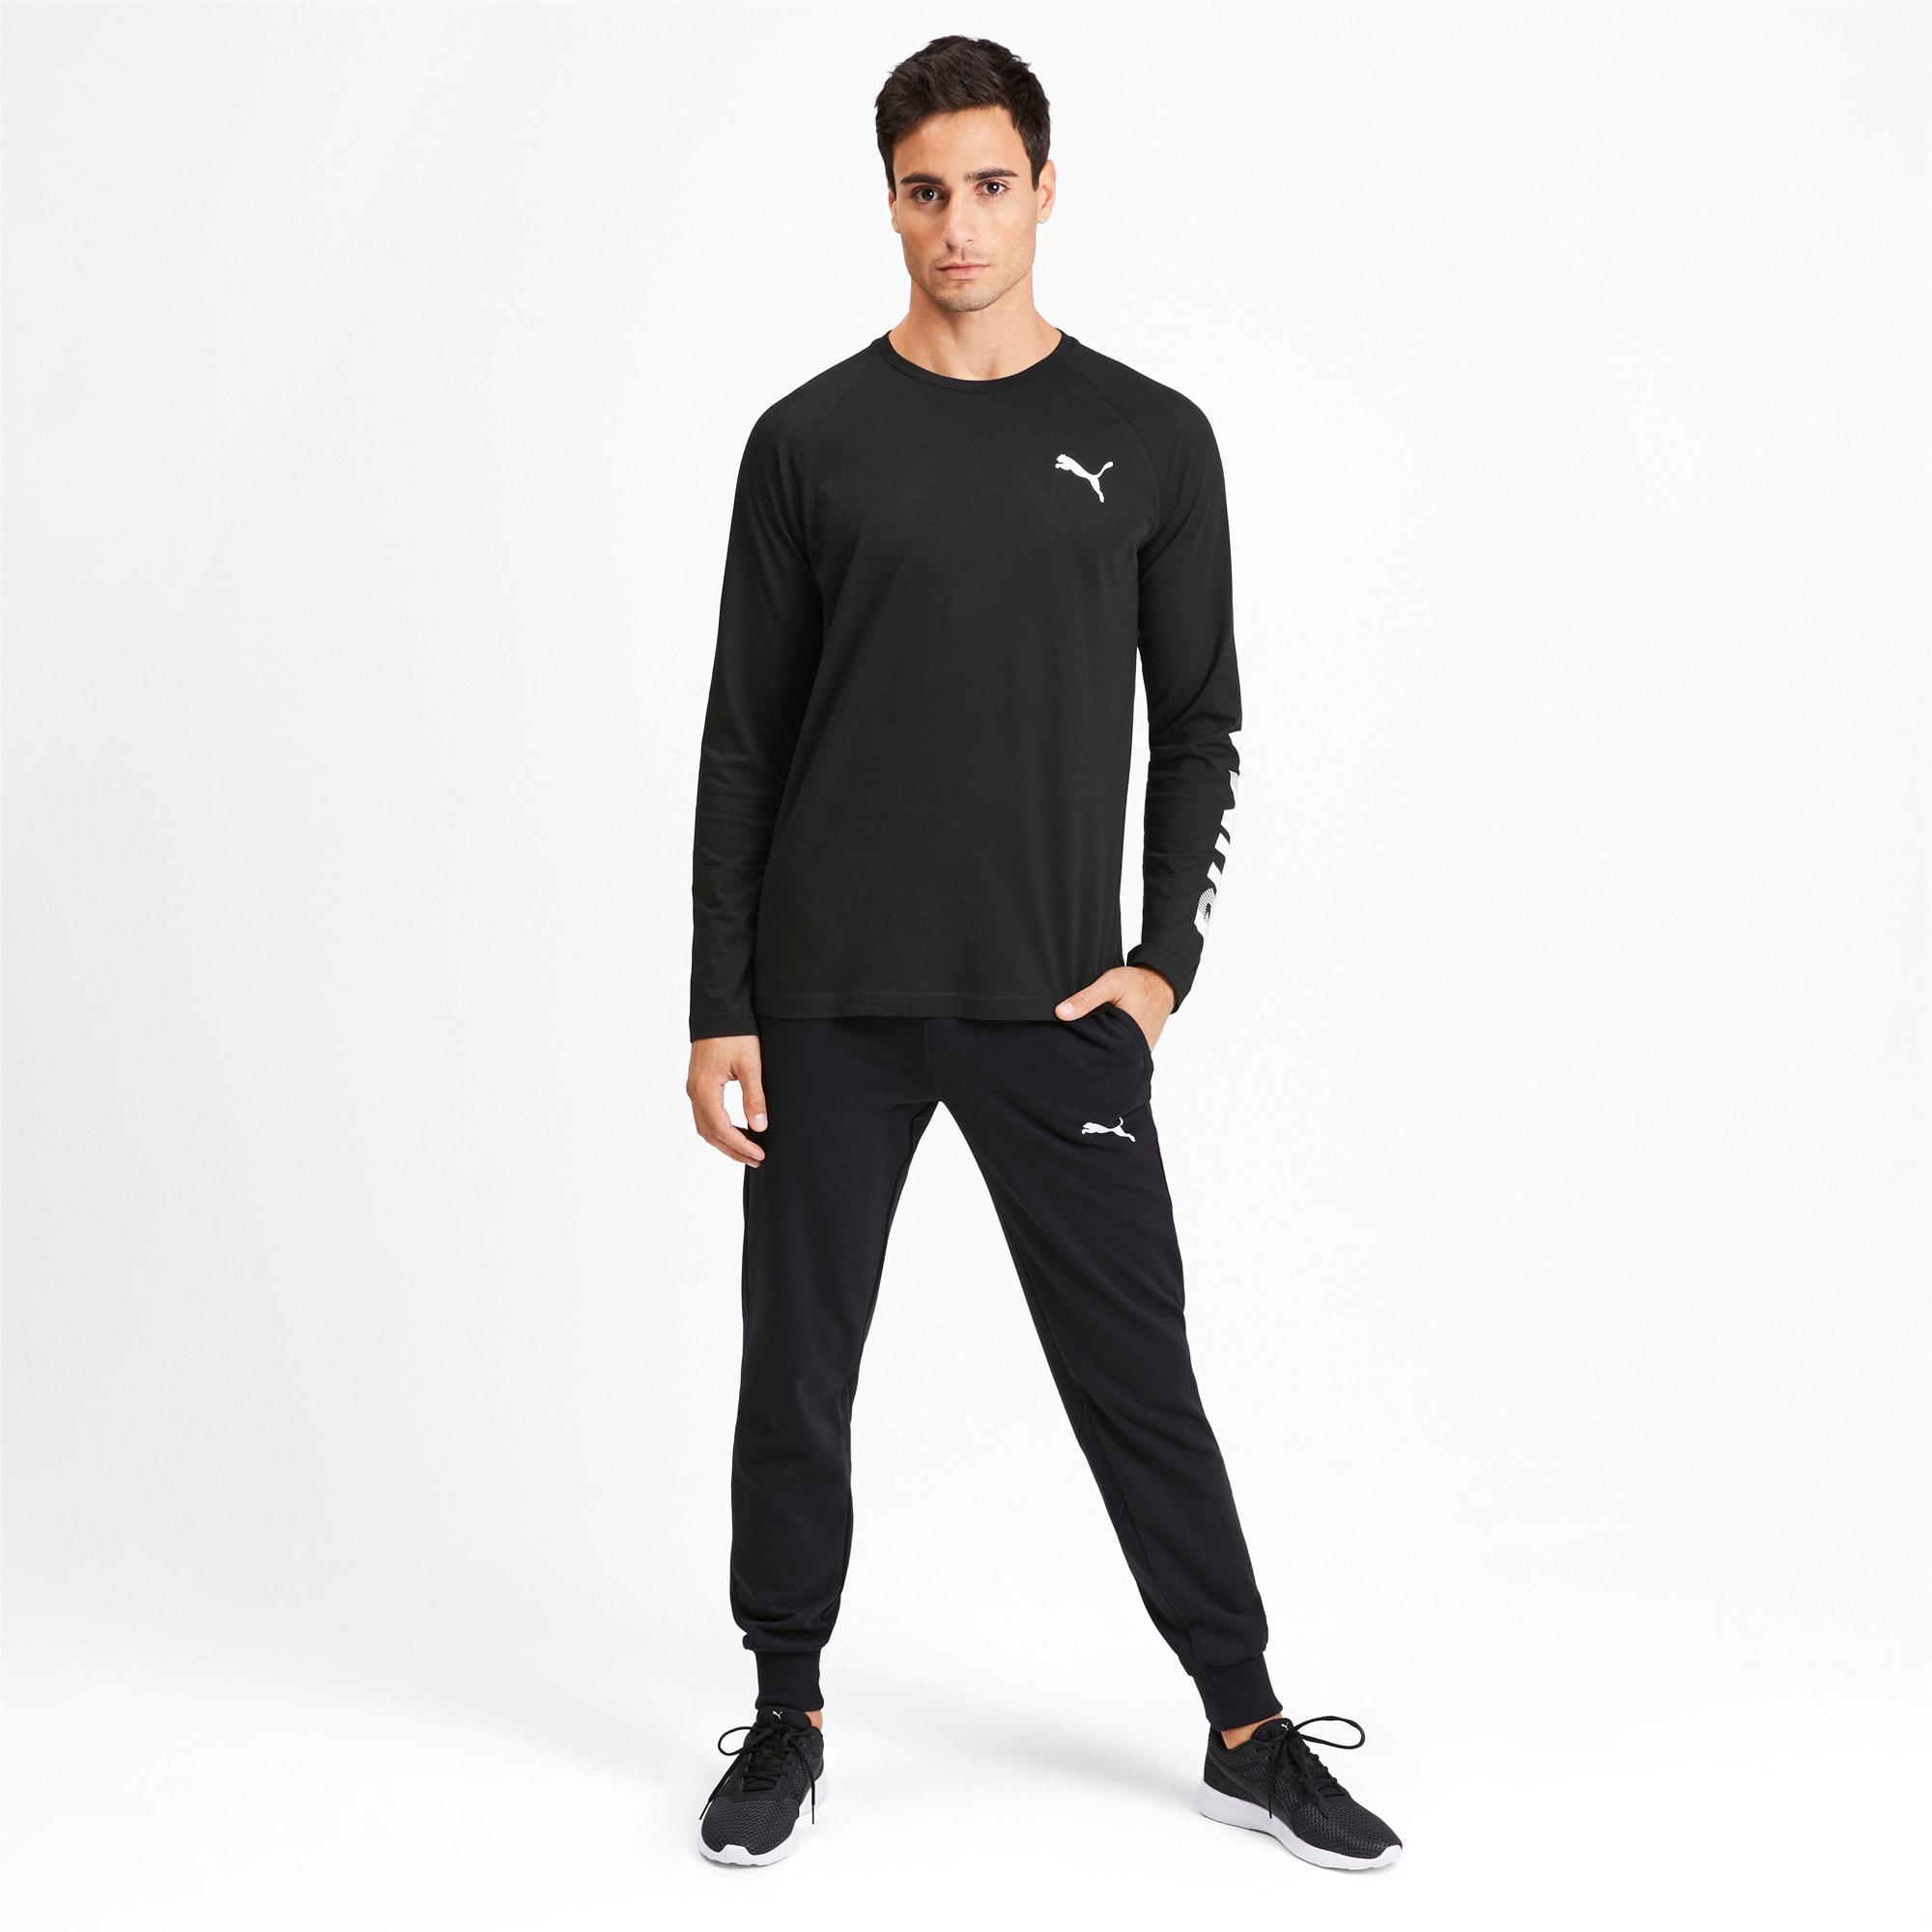 Thumbnail 4 of Modern Sports Men's Long Sleeve Tee, Puma Black, medium